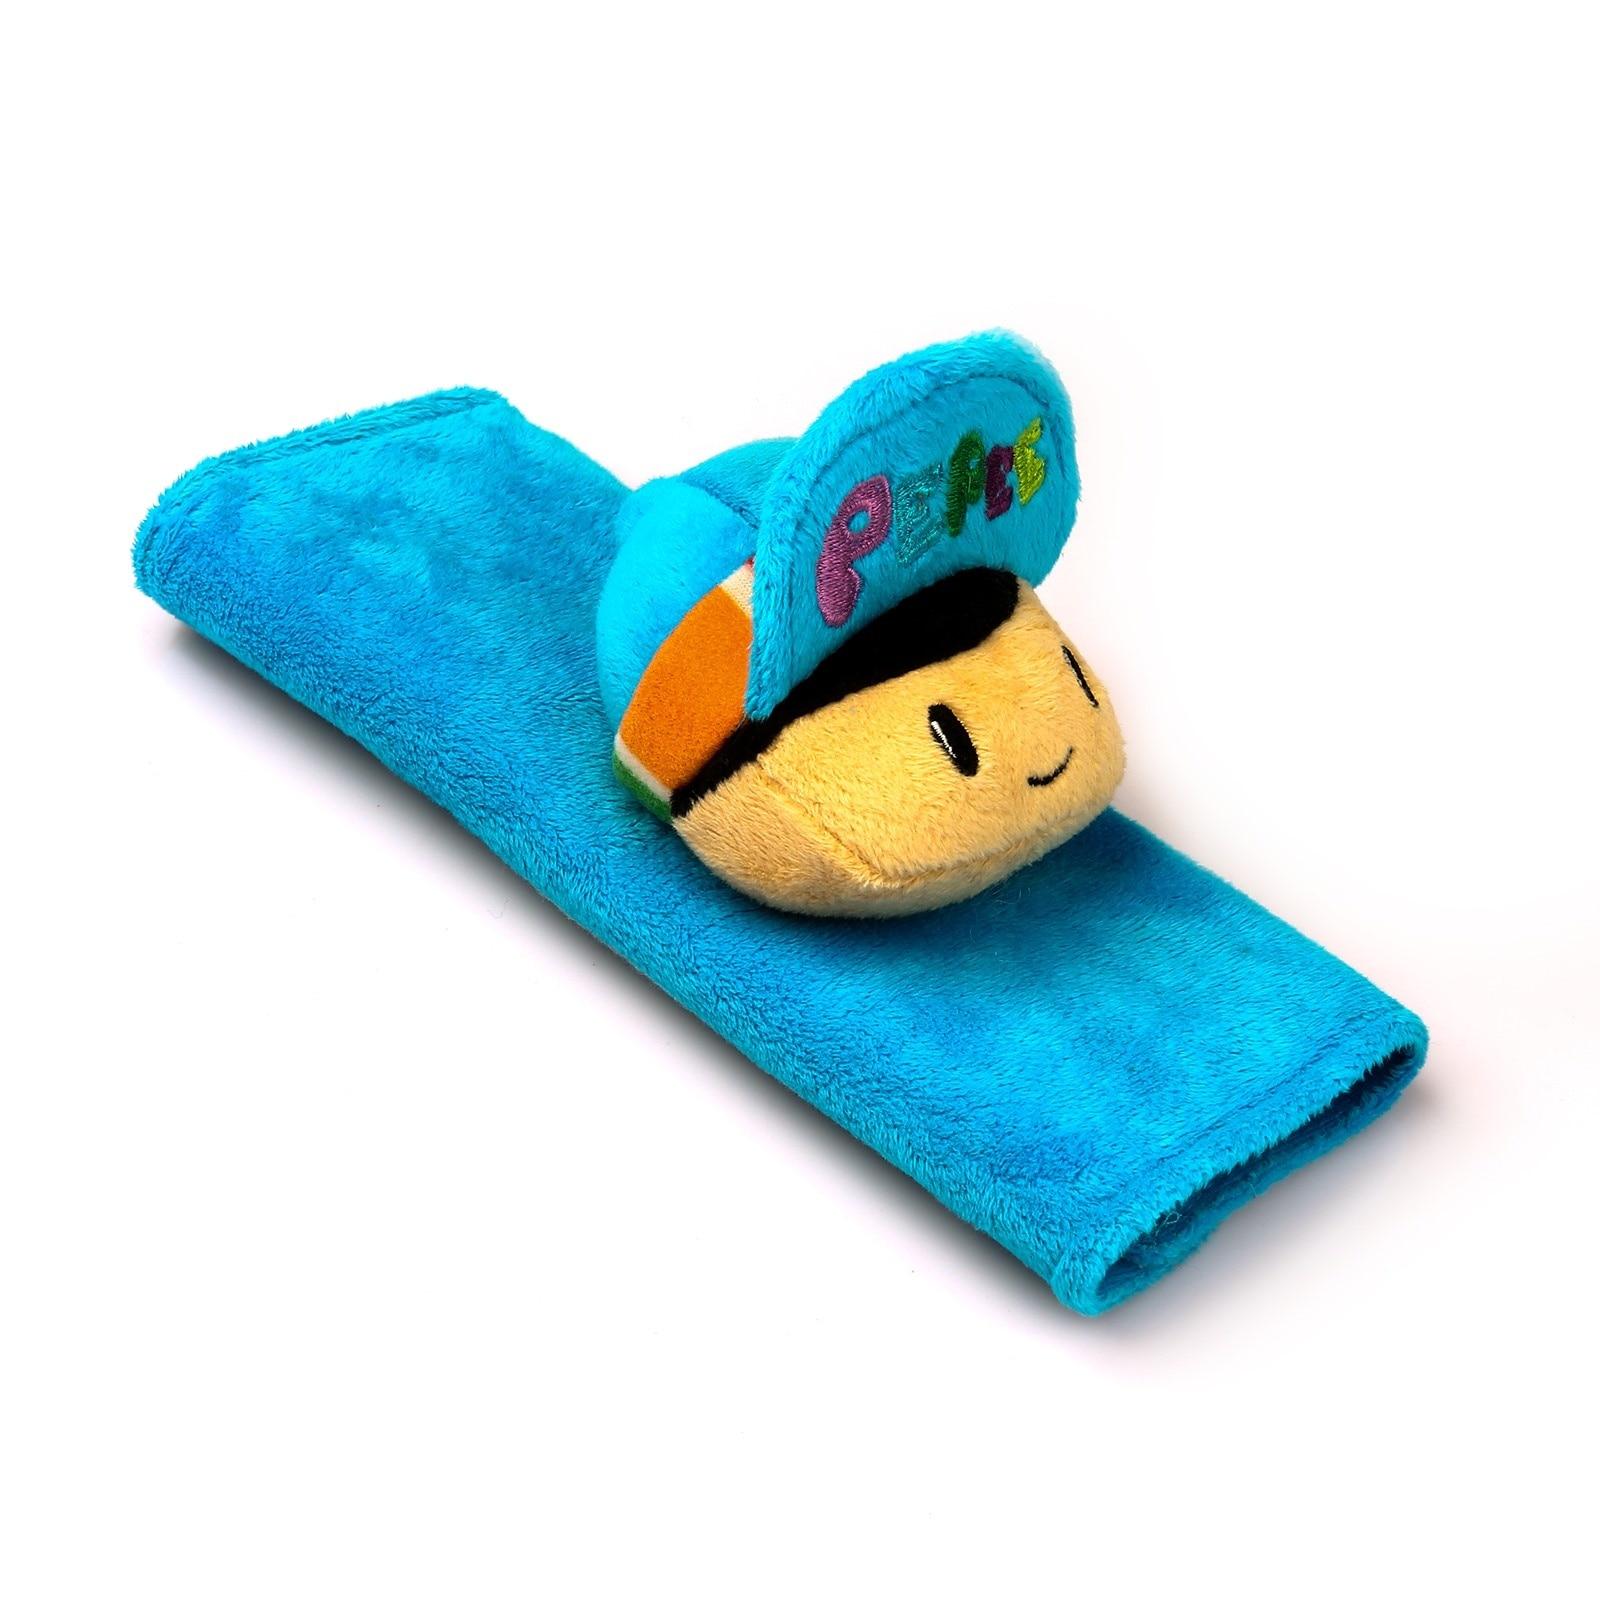 Ebebek Neco Toys Pepee Seat Belt Cover